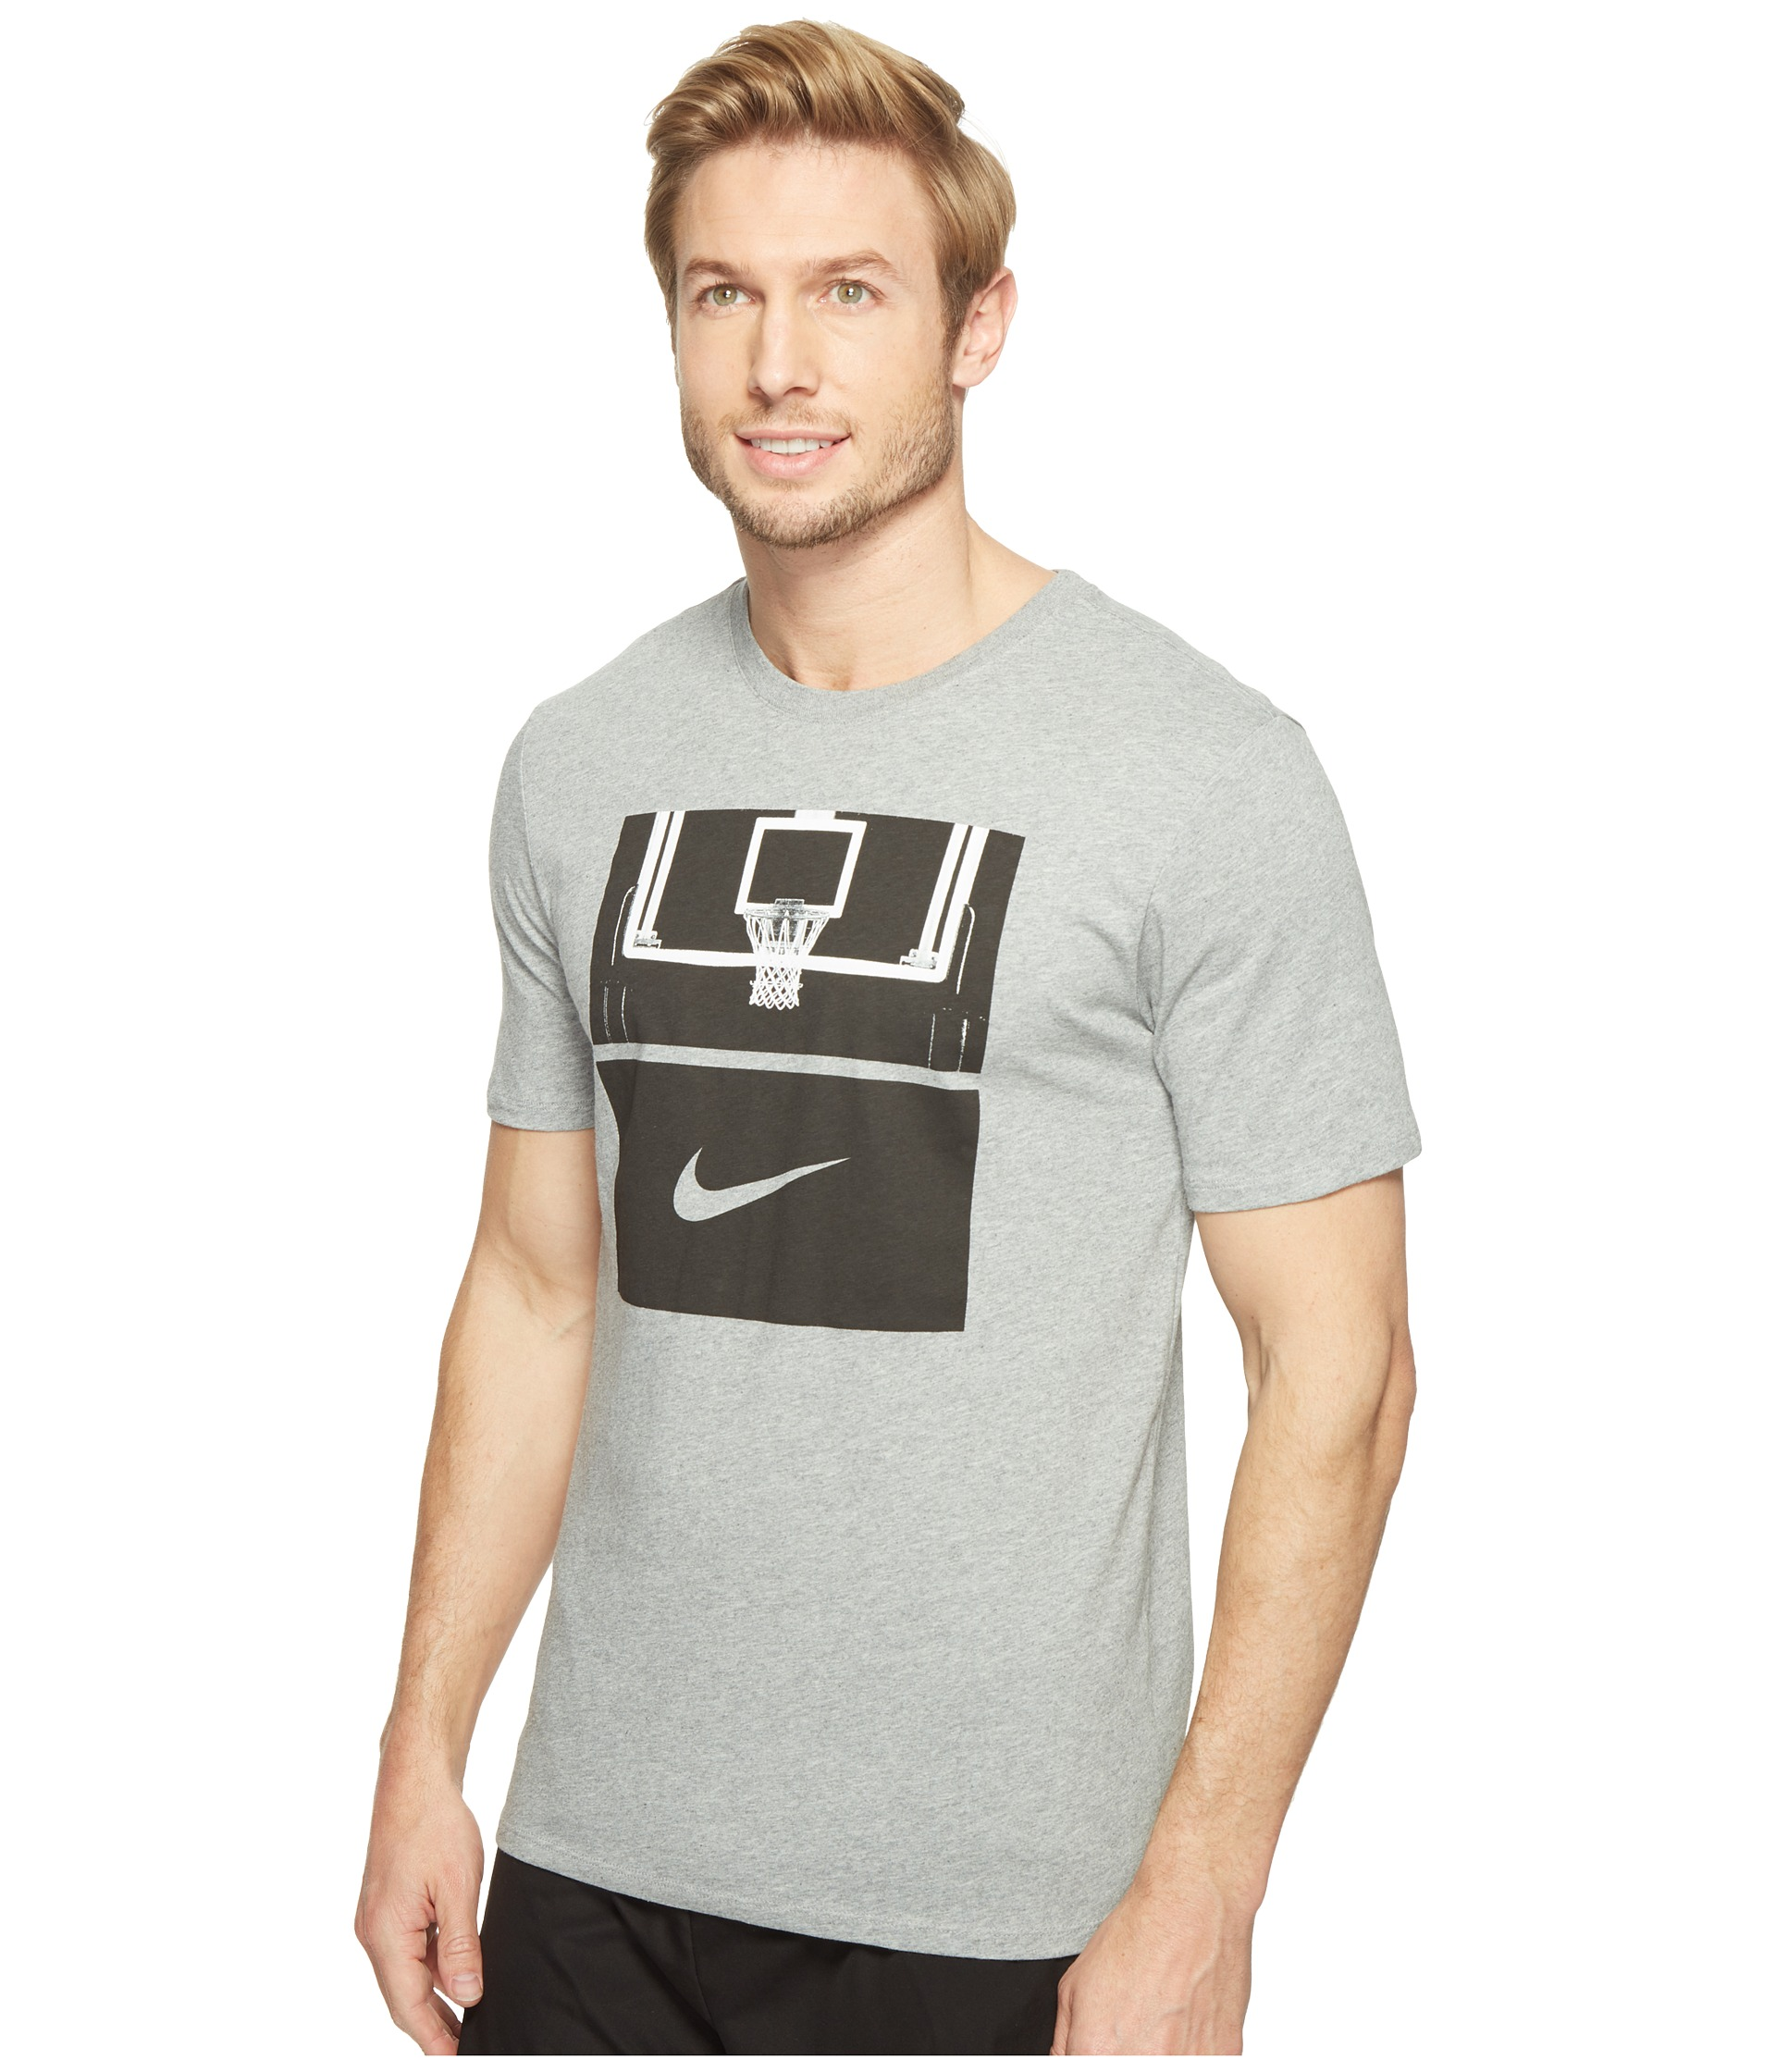 Nike Dry Basketball Hoop T Shirt